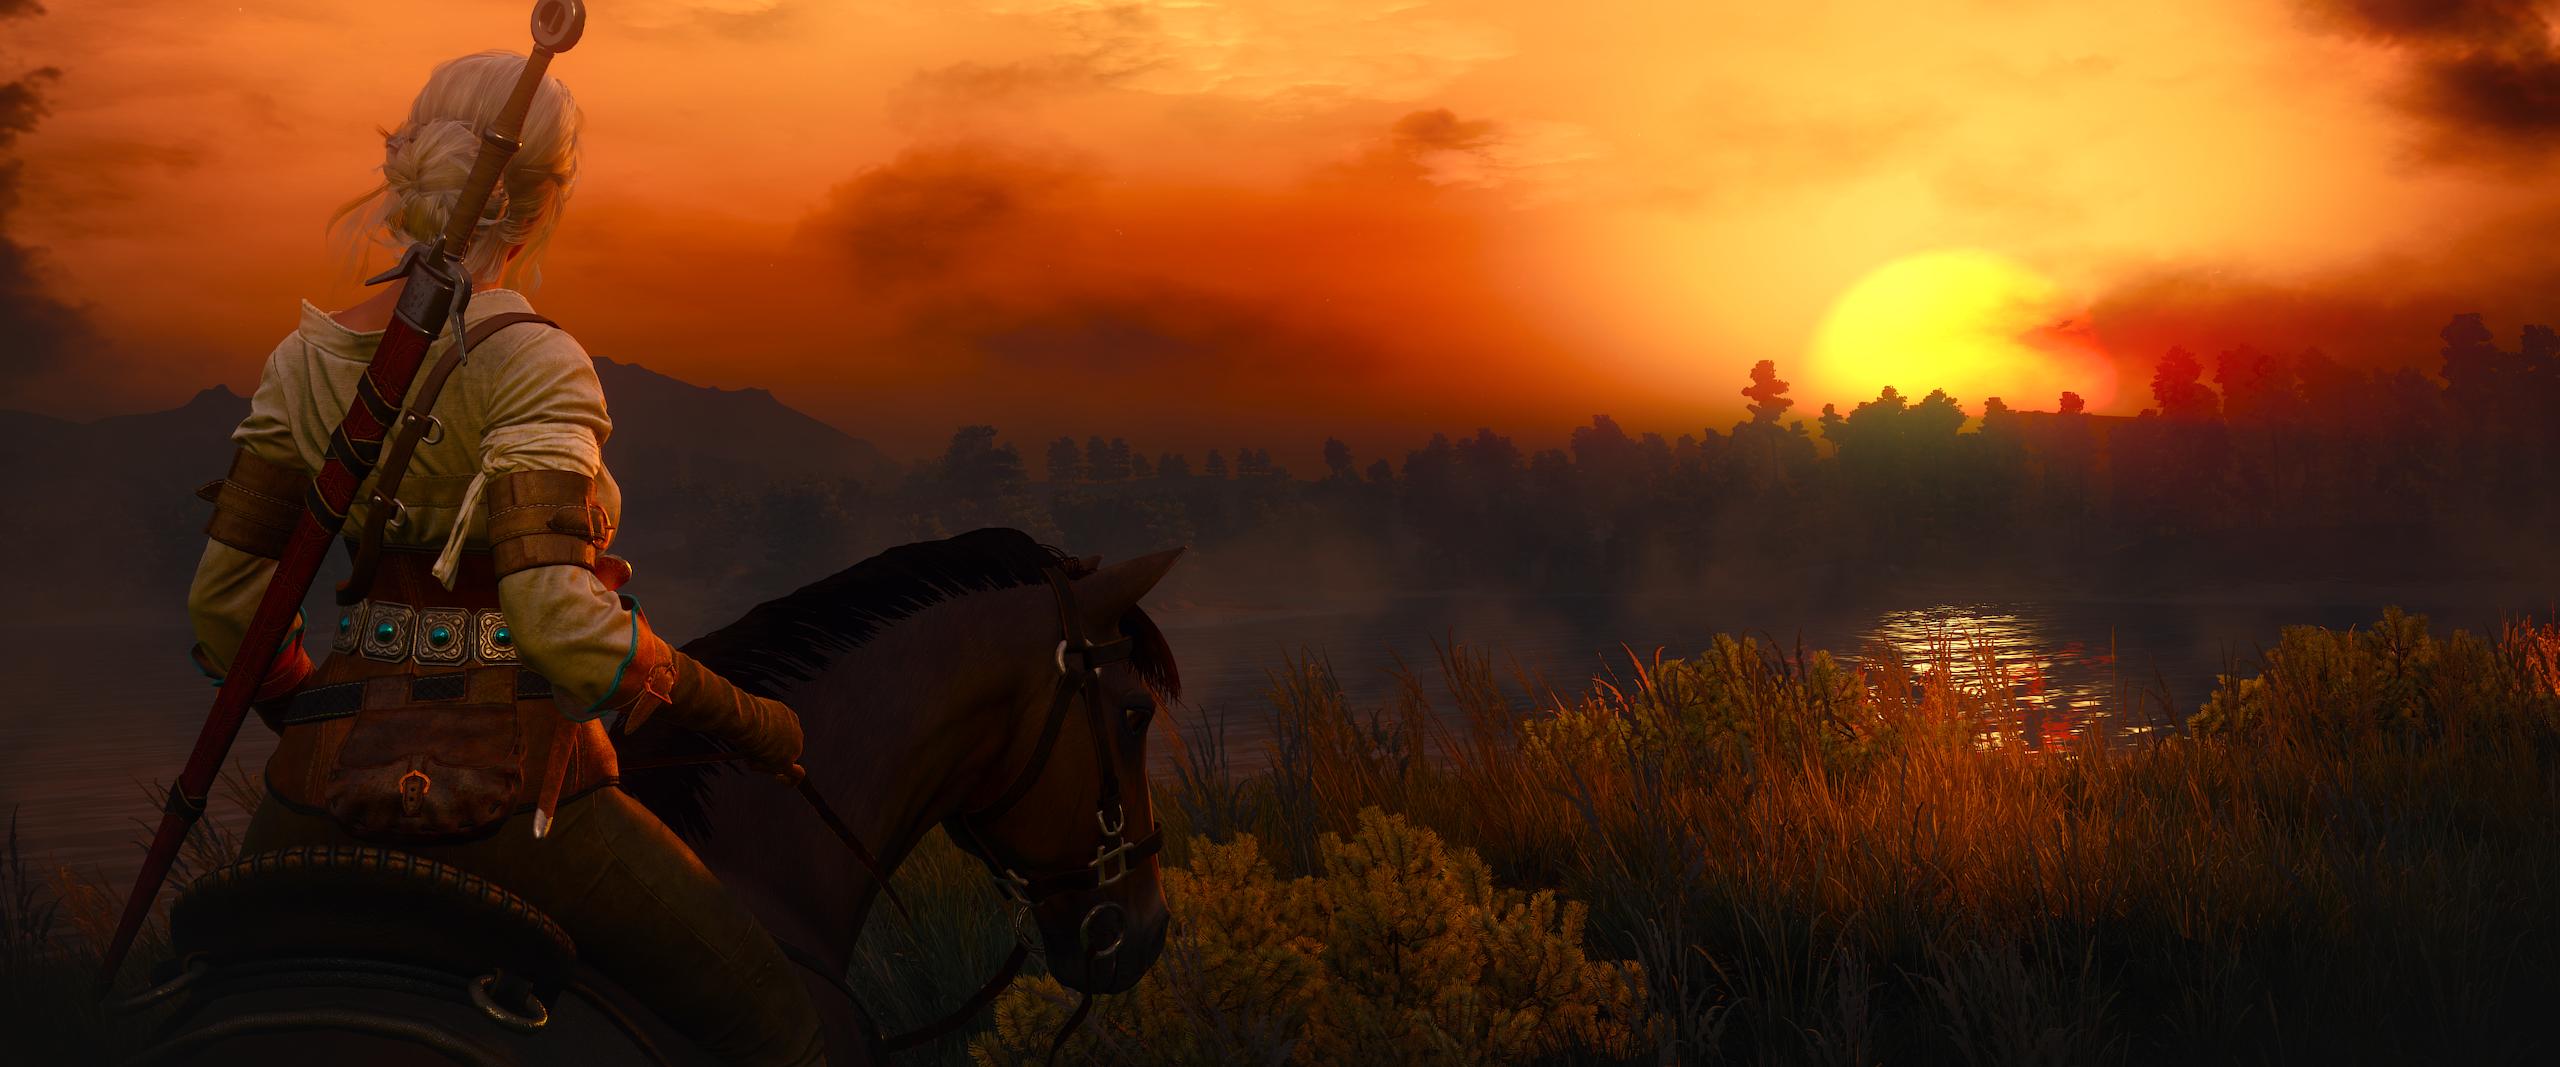 attheendoftheday.png - Witcher 3: Wild Hunt, the